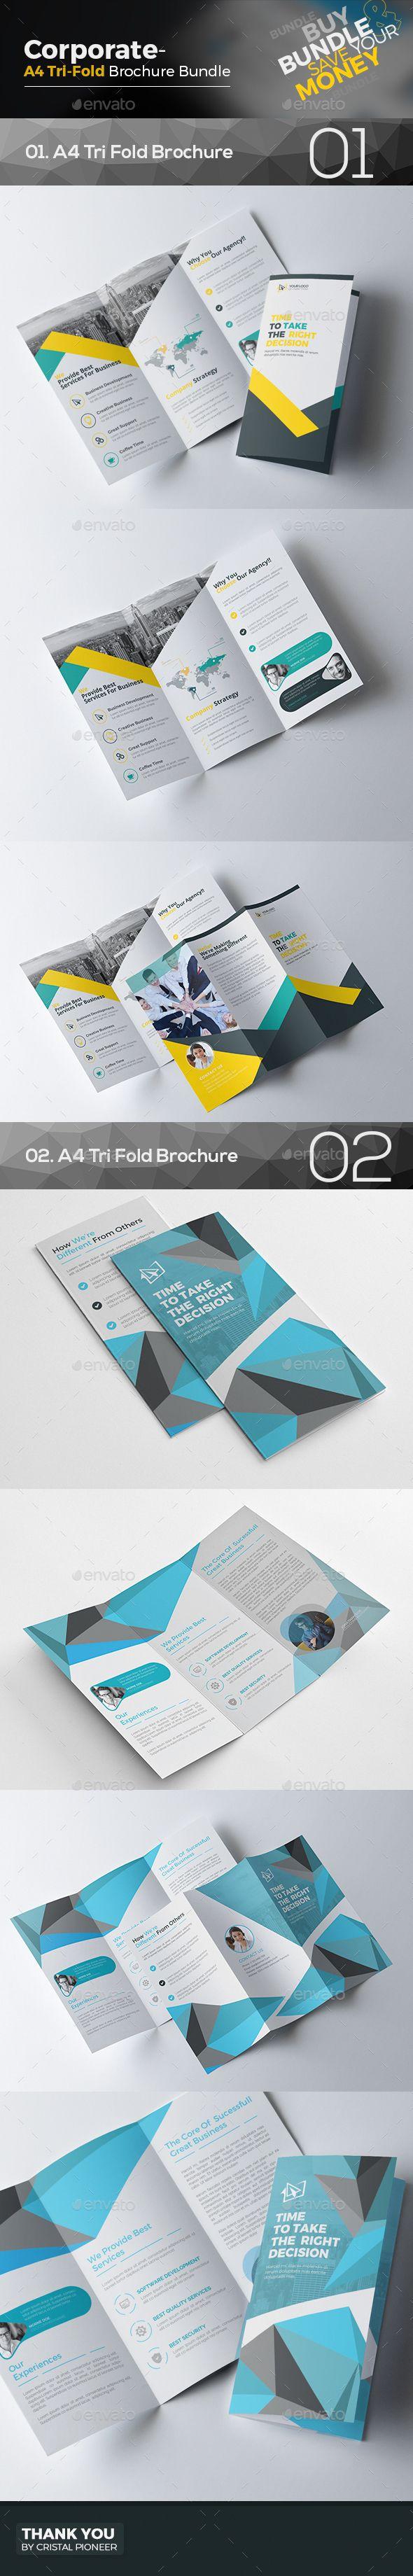 Tri Fold Brochure Bundle In Tri Fold Brochure Template Tri - A4 tri fold brochure template